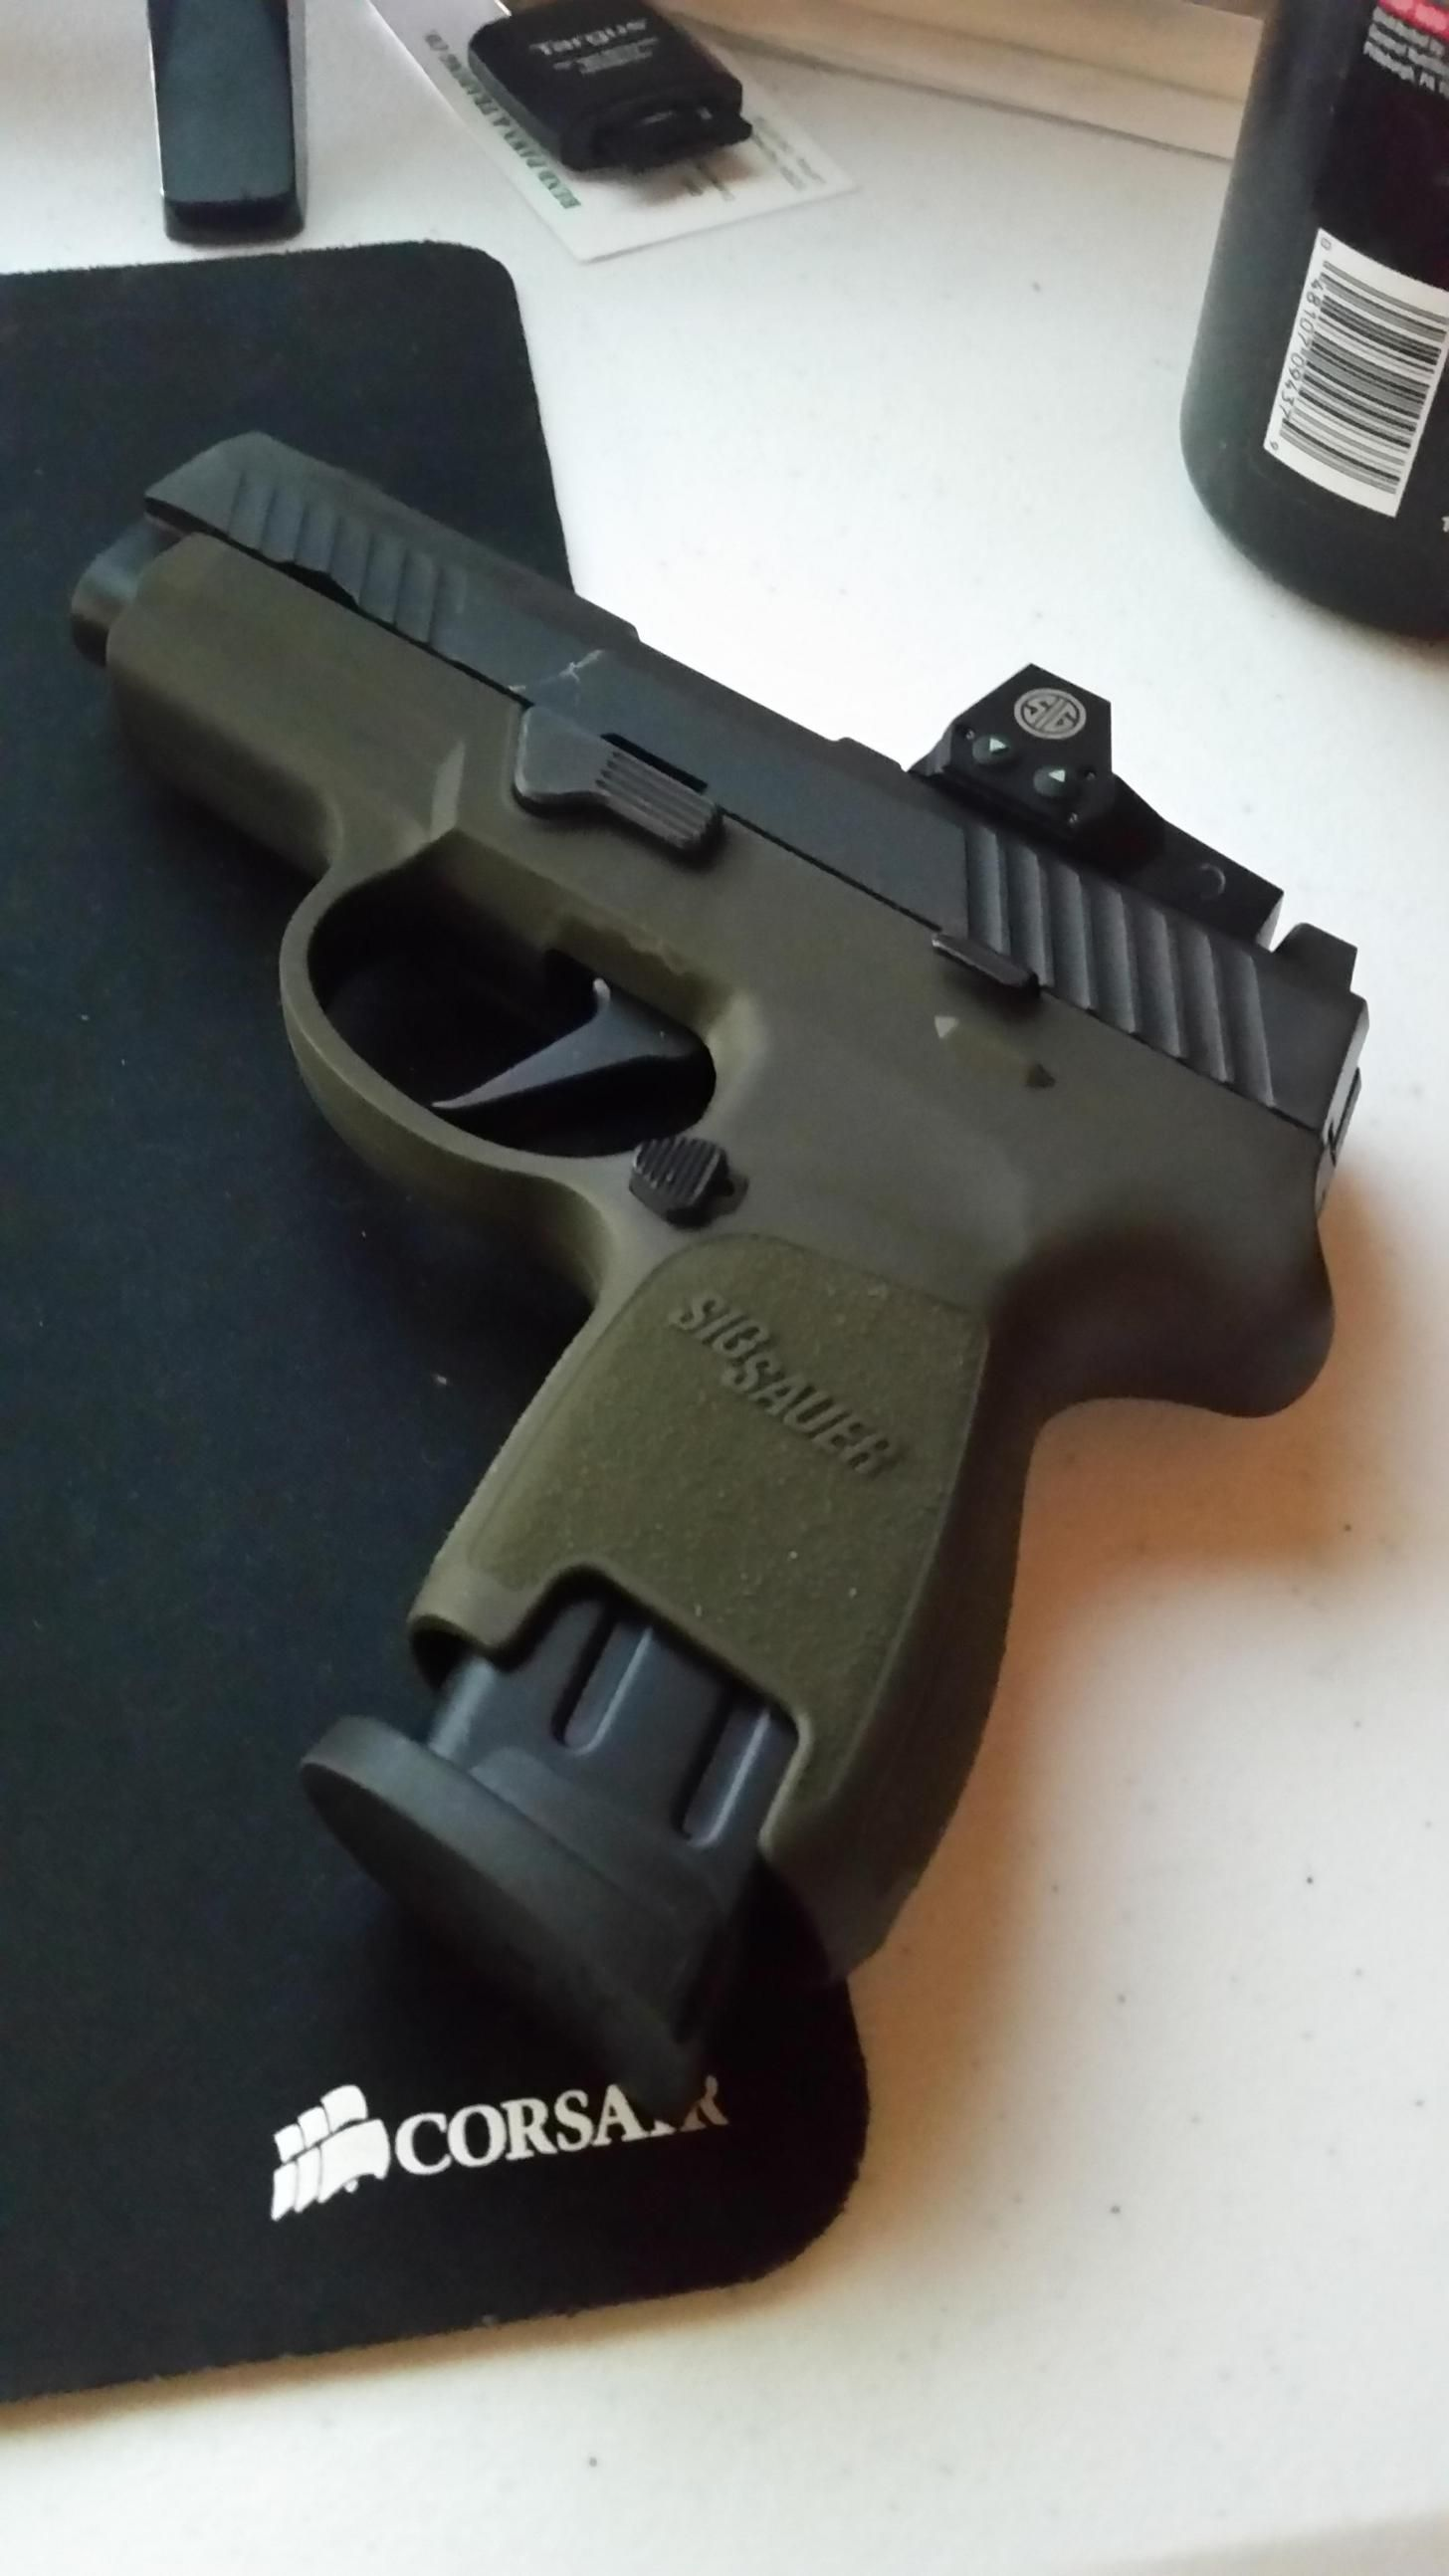 P320 RX Subcompact FDE - Album on Imgur | Firearms